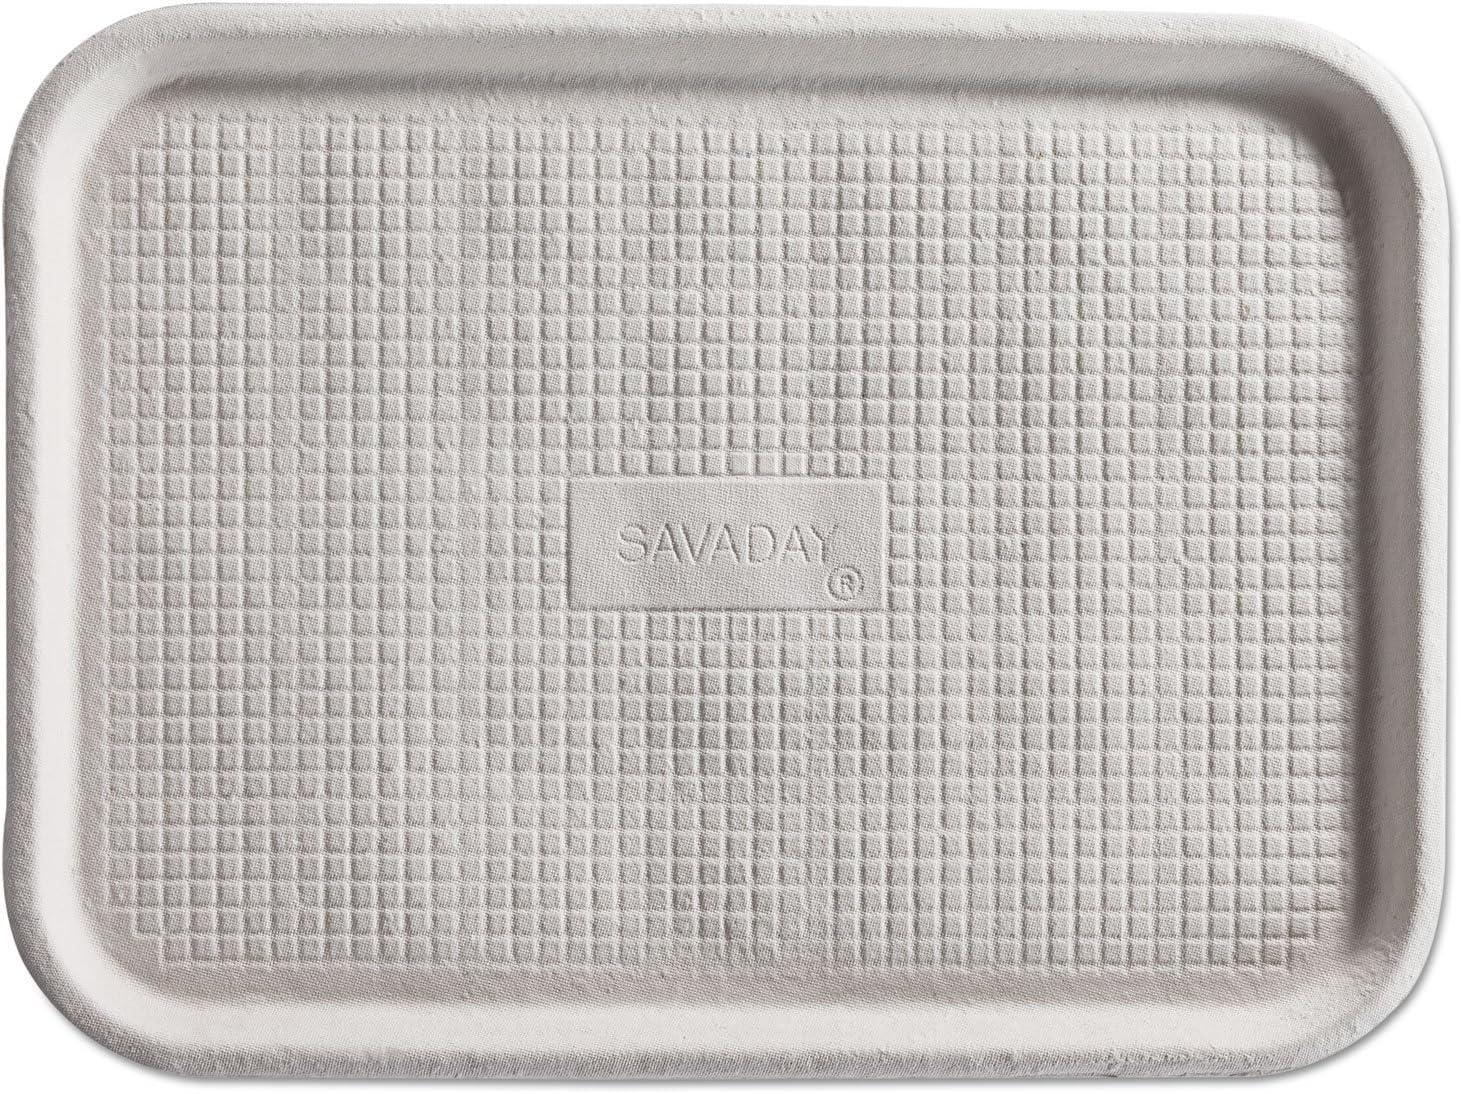 Chinet Savaday Molded Fiber Flat Food Tray, White, 12x16 HUHFALL